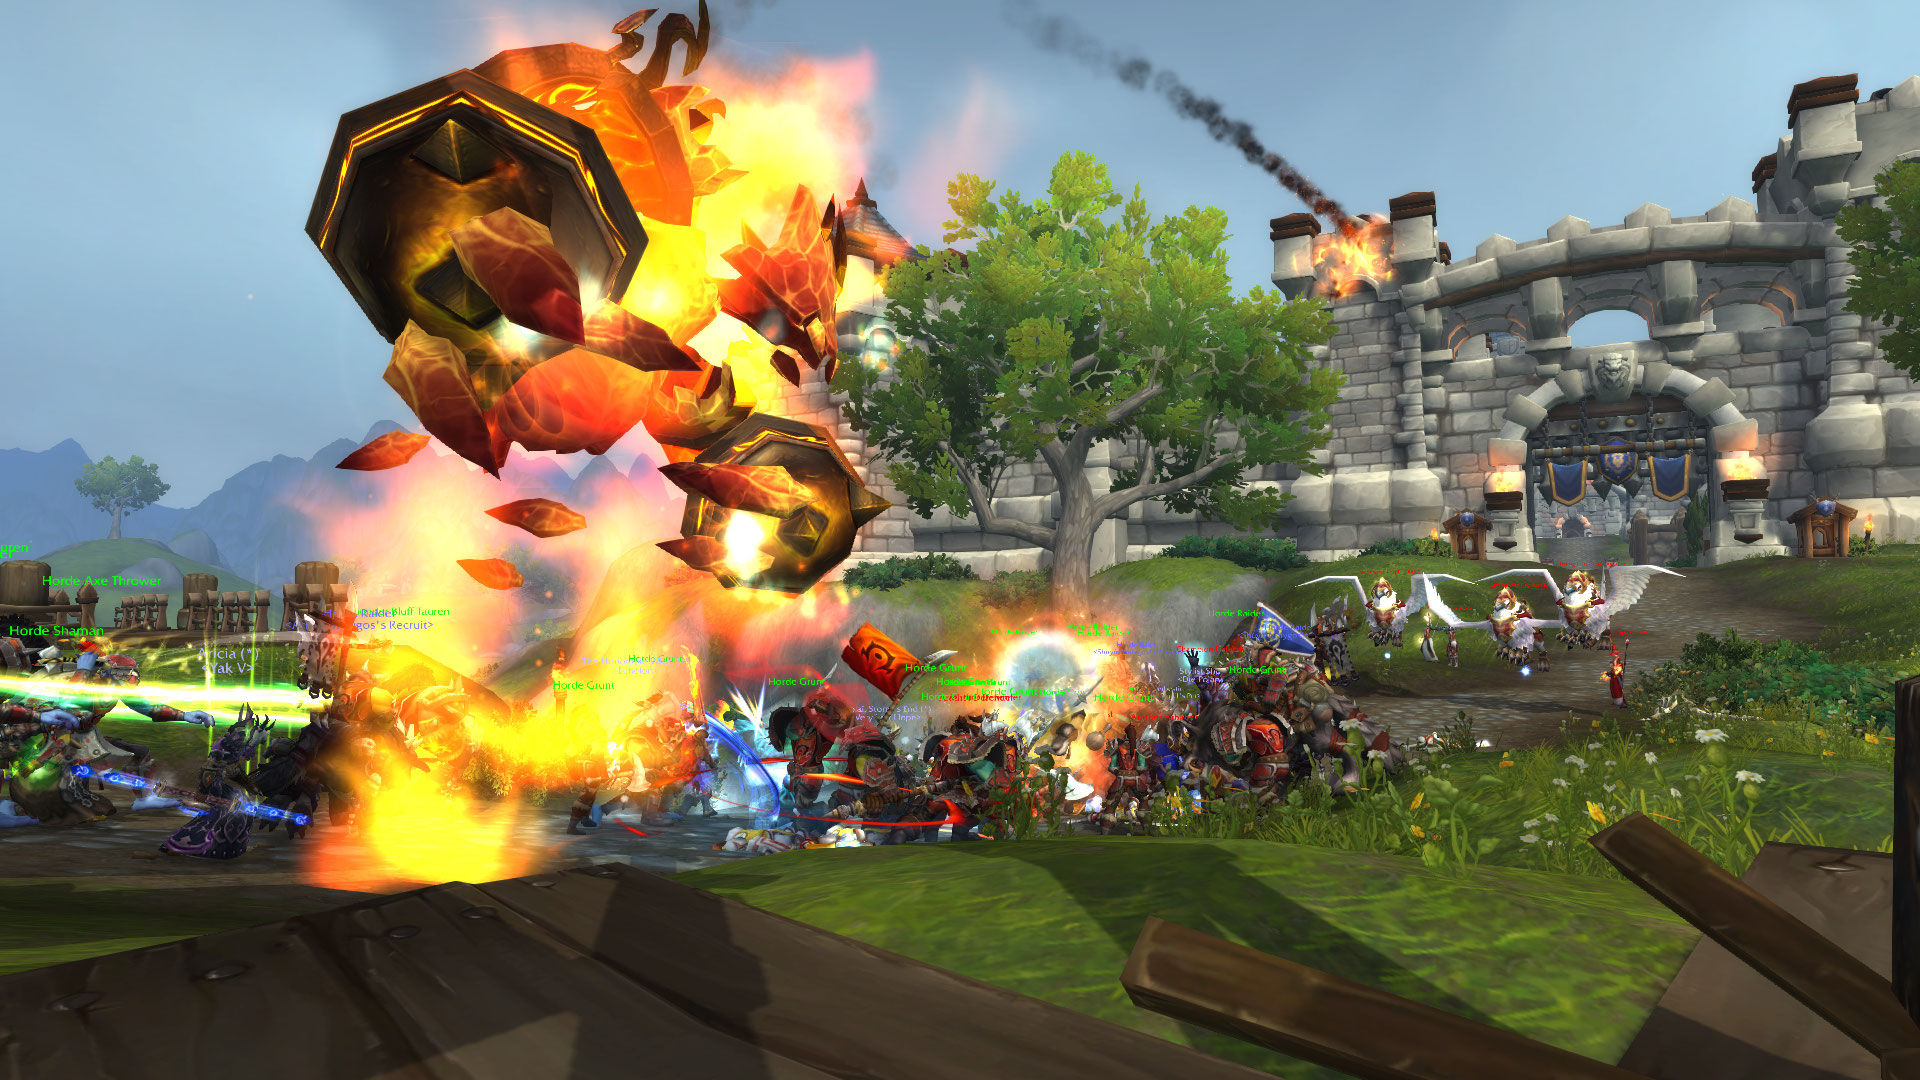 WoW BfA Fire Elemental Stromgarde Warfront